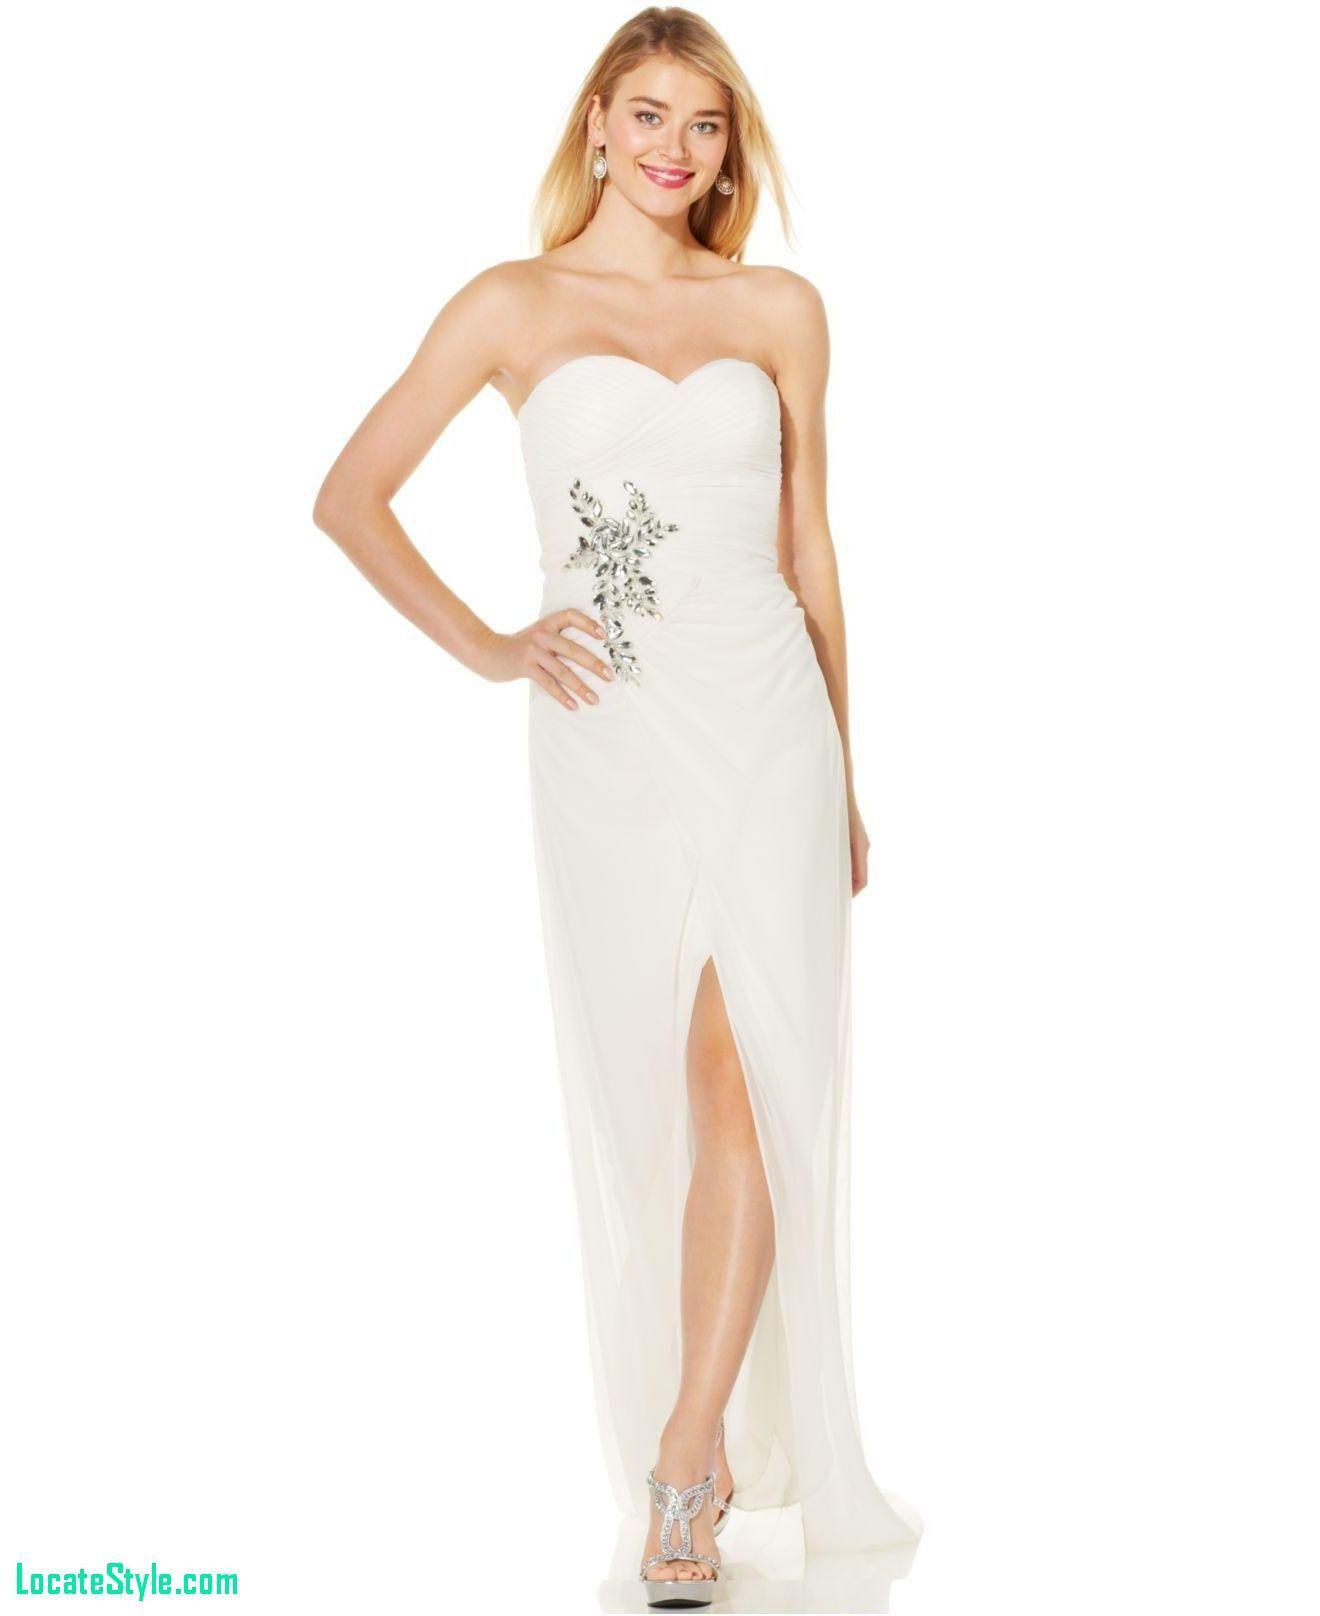 Dillards Wedding Dresses Mother Of the Bride - Informal Wedding ...